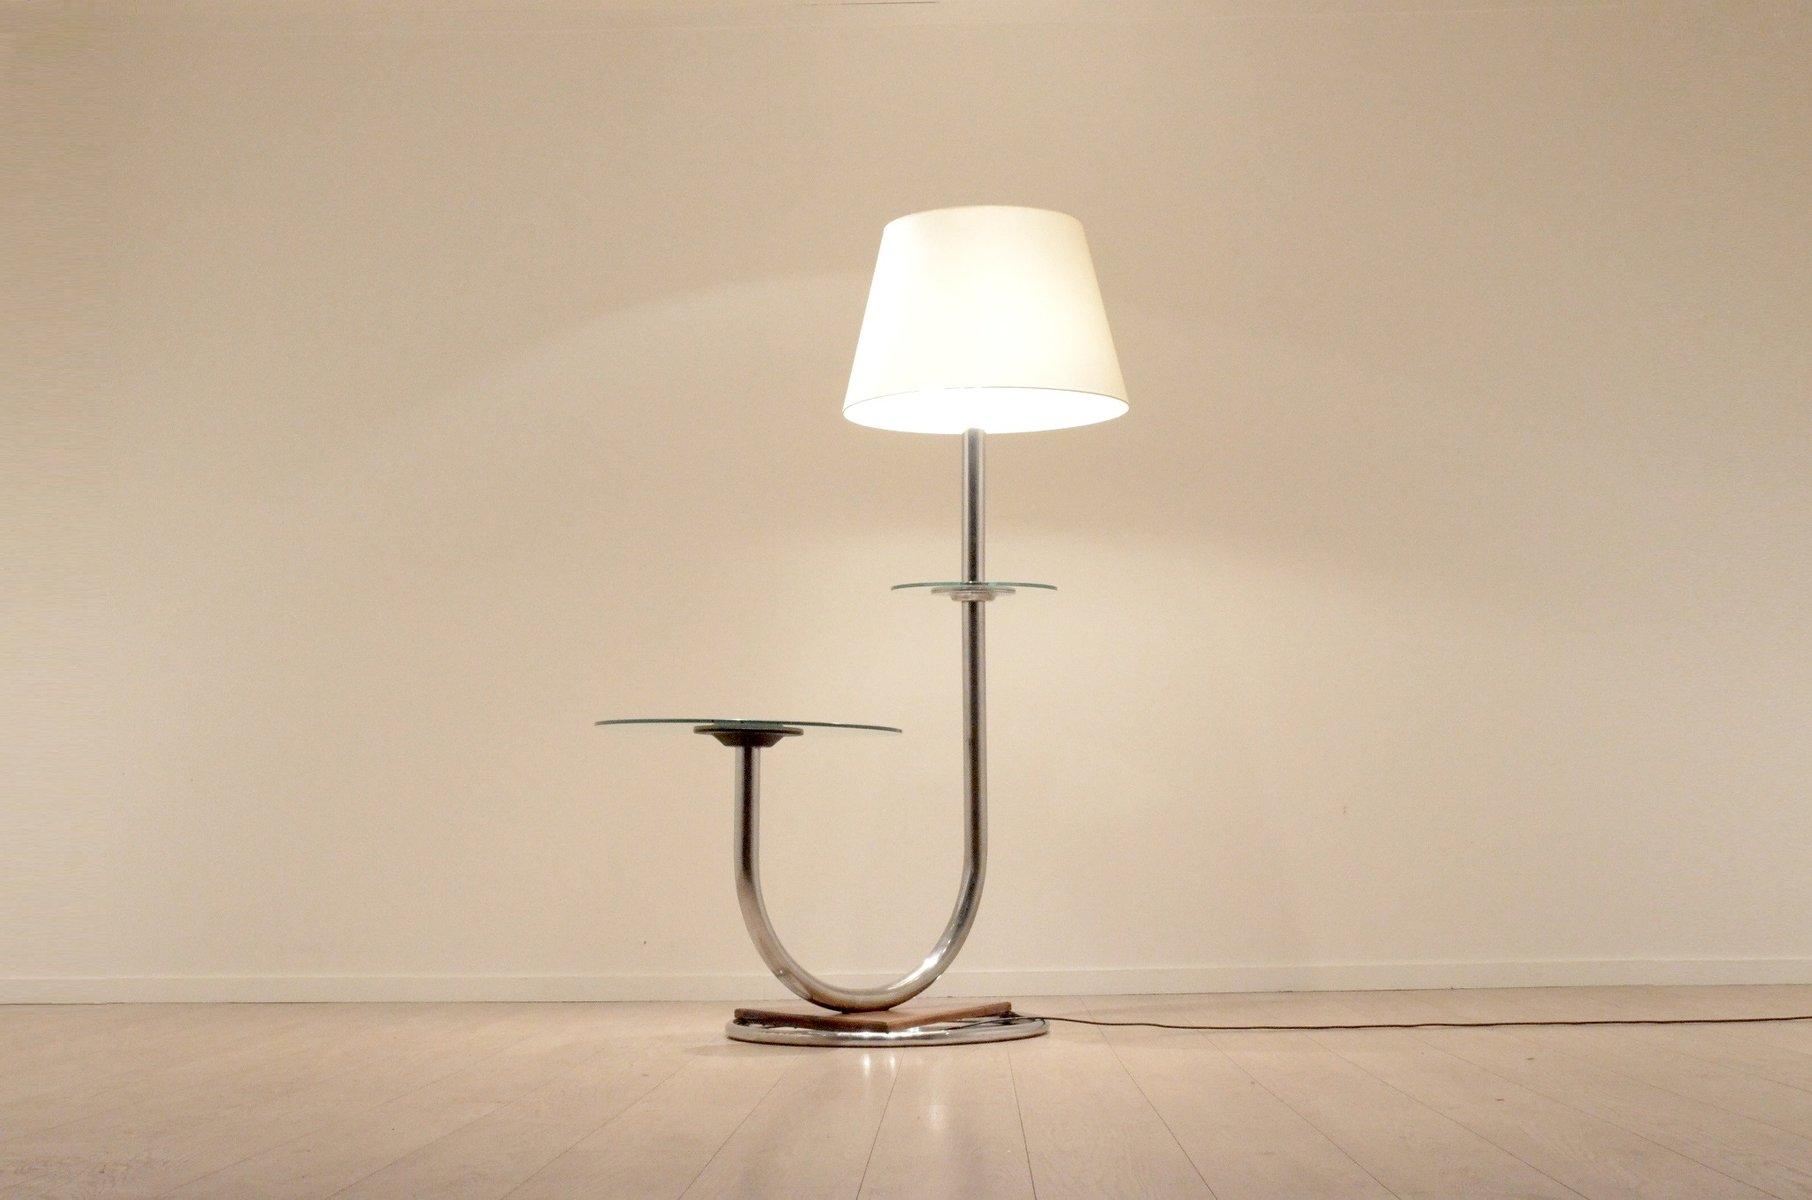 Art Deco Chromium & Walnut Floor Lamp with Side Table for sale